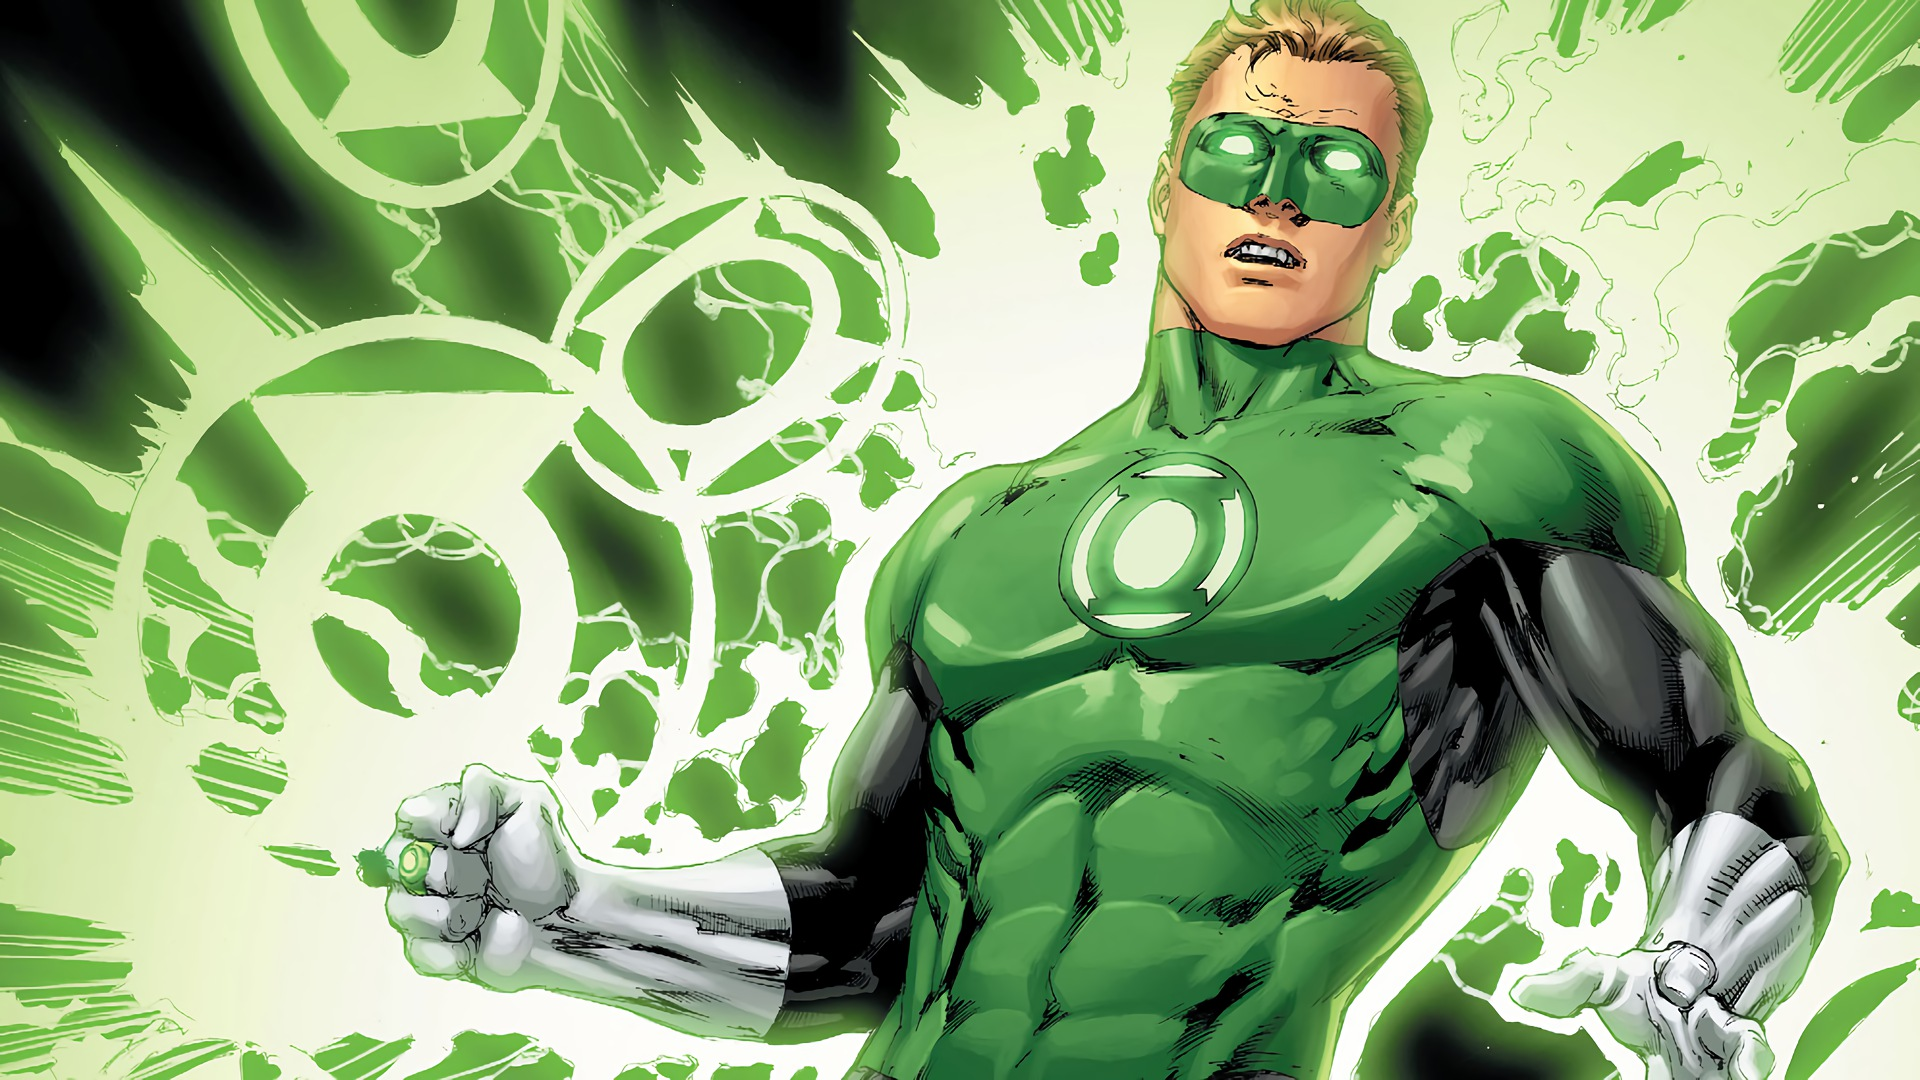 Green Lantern HD Wallpaper   Background Image   1920x1080 ...